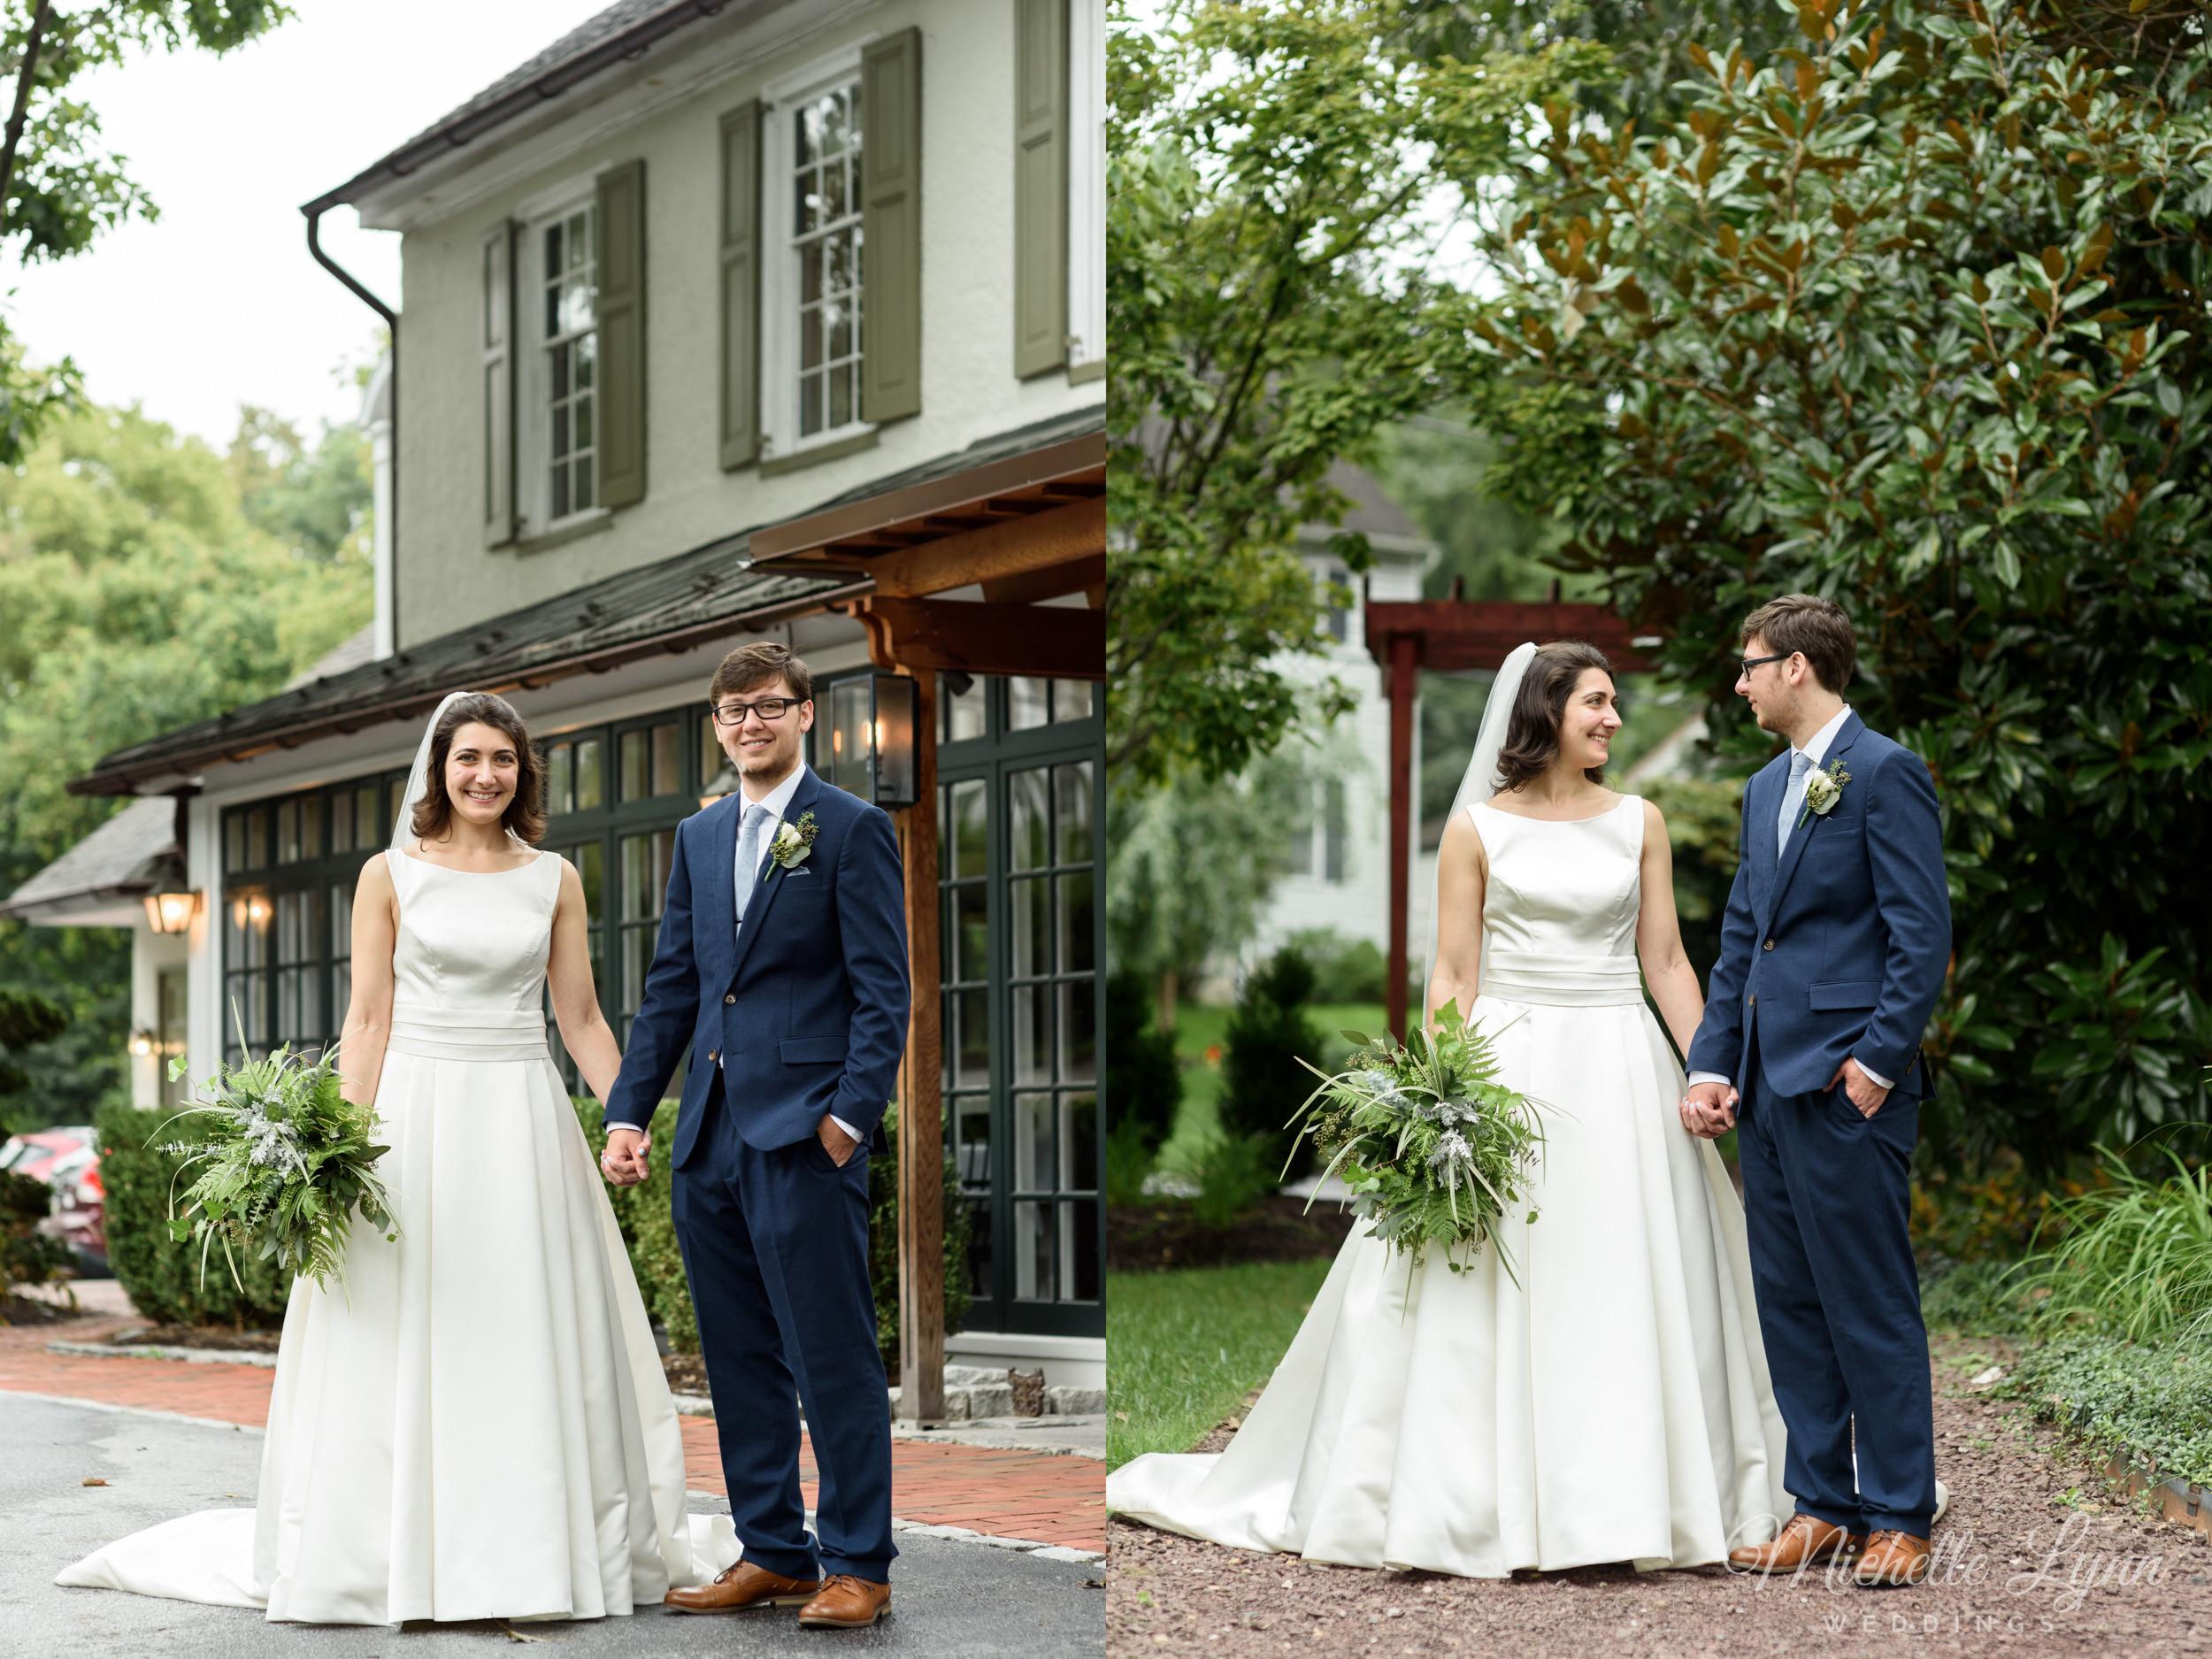 mlw-general-warren-malvern-wedding-photographer-21.jpg